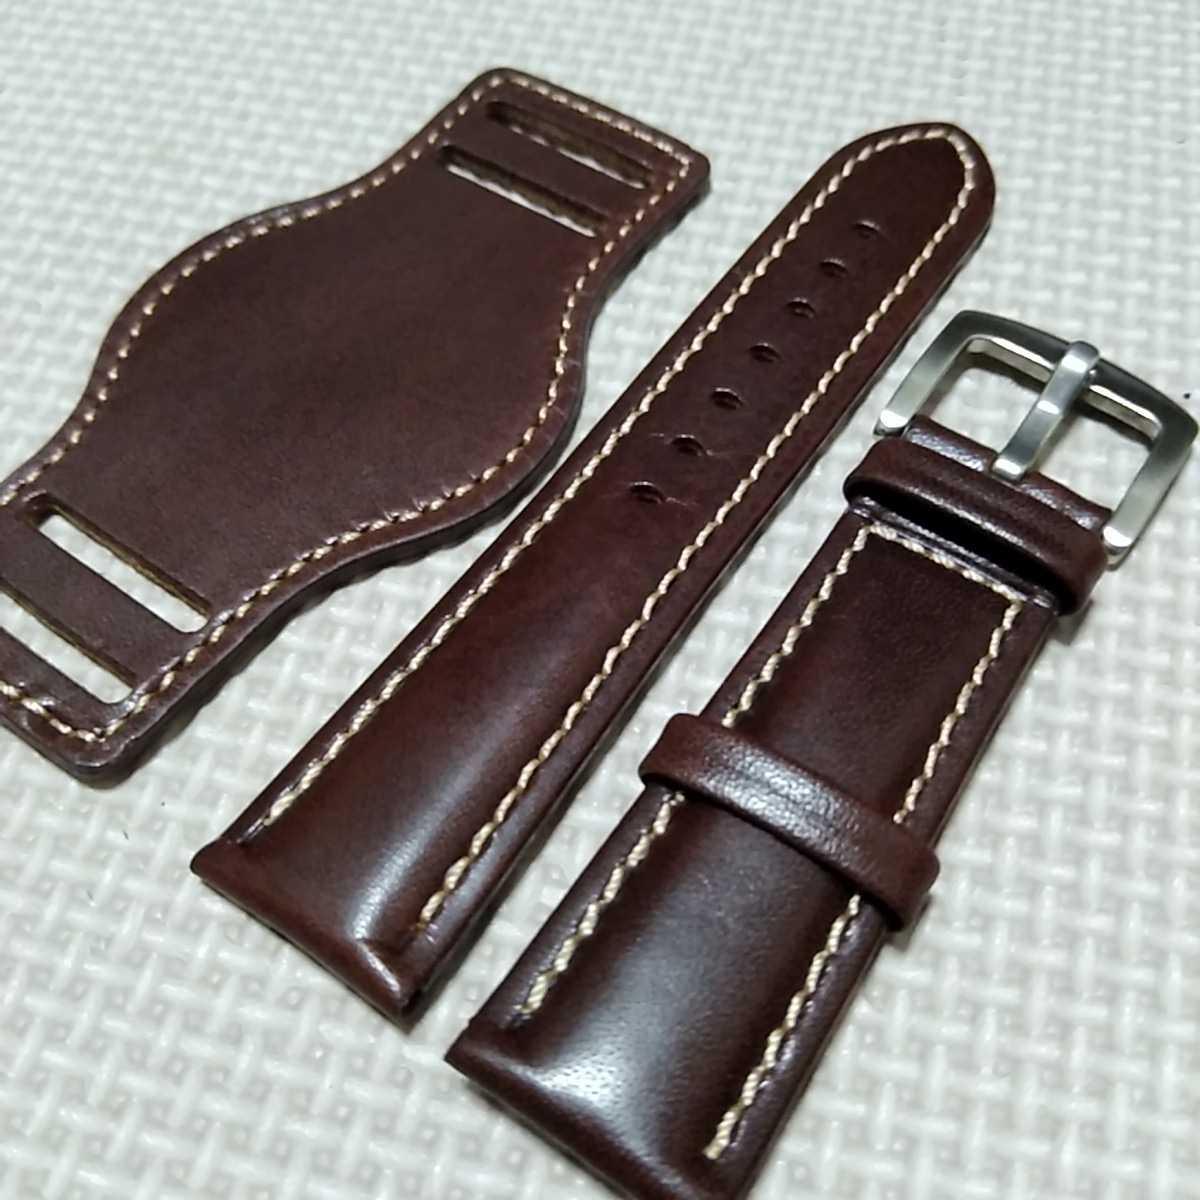 No50 ブンド BUND 本革レザーベルト 腕時計ベルト 交換用ストラップ ブラウン 22mm 未使用 高品質 ドイツパイロット 空軍_画像9